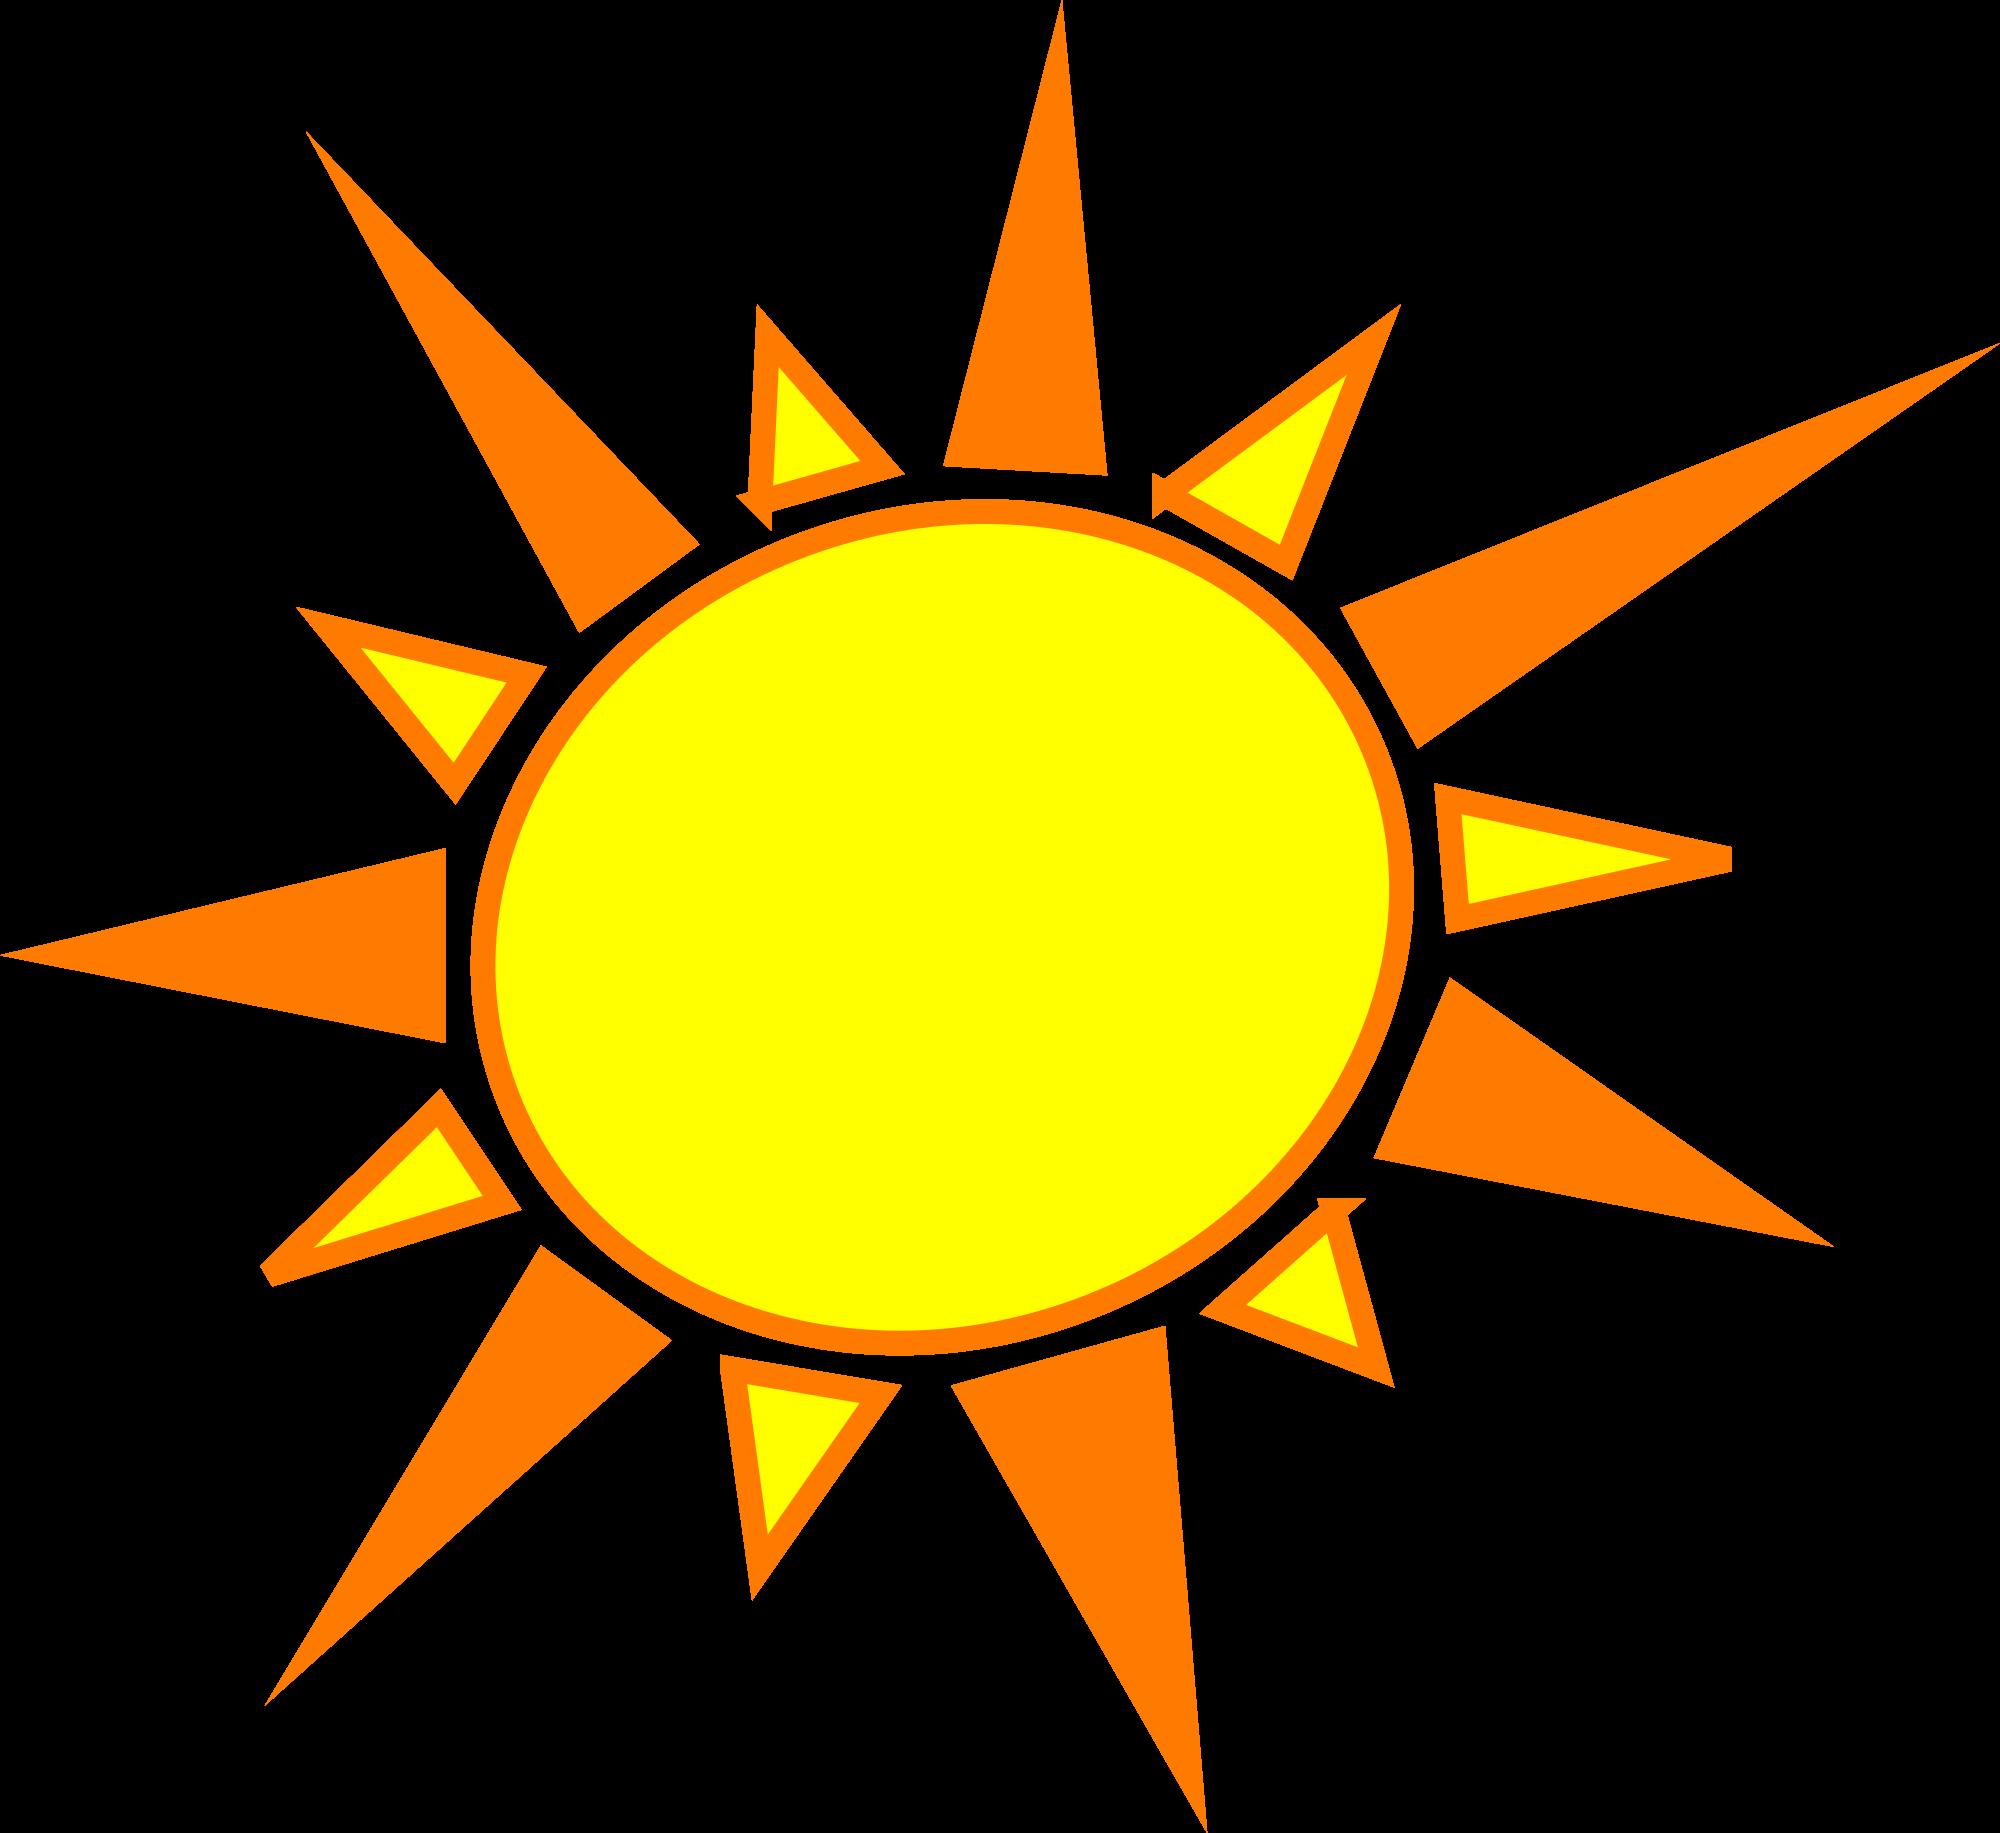 Clipart sun pdf.  collection of transparent